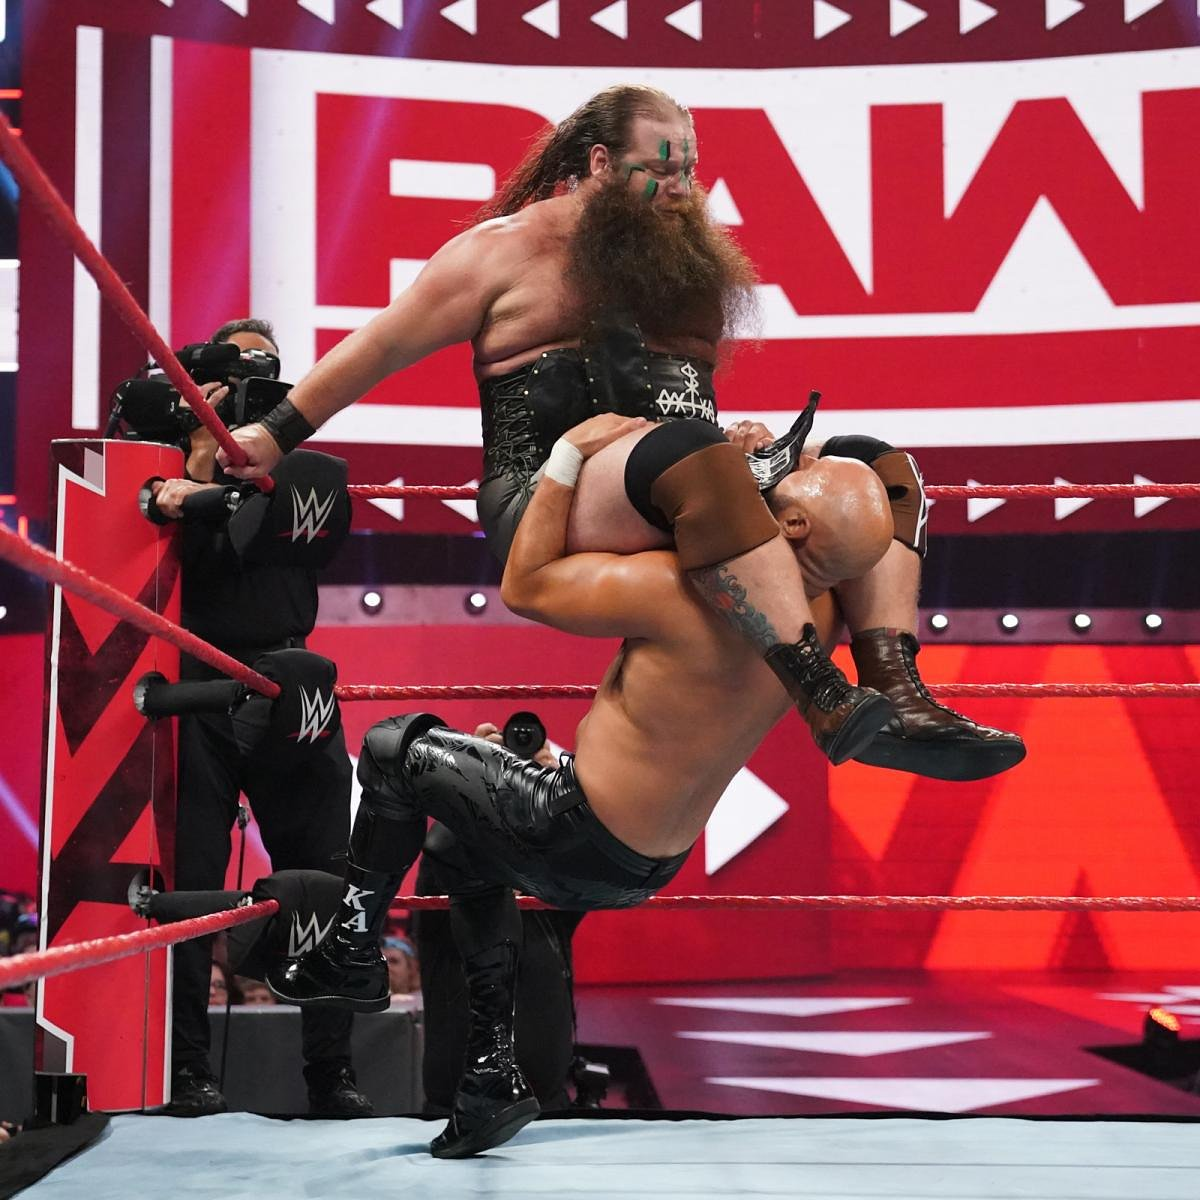 RT @Ivar_WWE: And.... Squish! #JoinTheRaid #VikingRaiders #VikingExperience #305Live #wwe #wweraw #raw https://t.co/WkAx9ZJ7qL